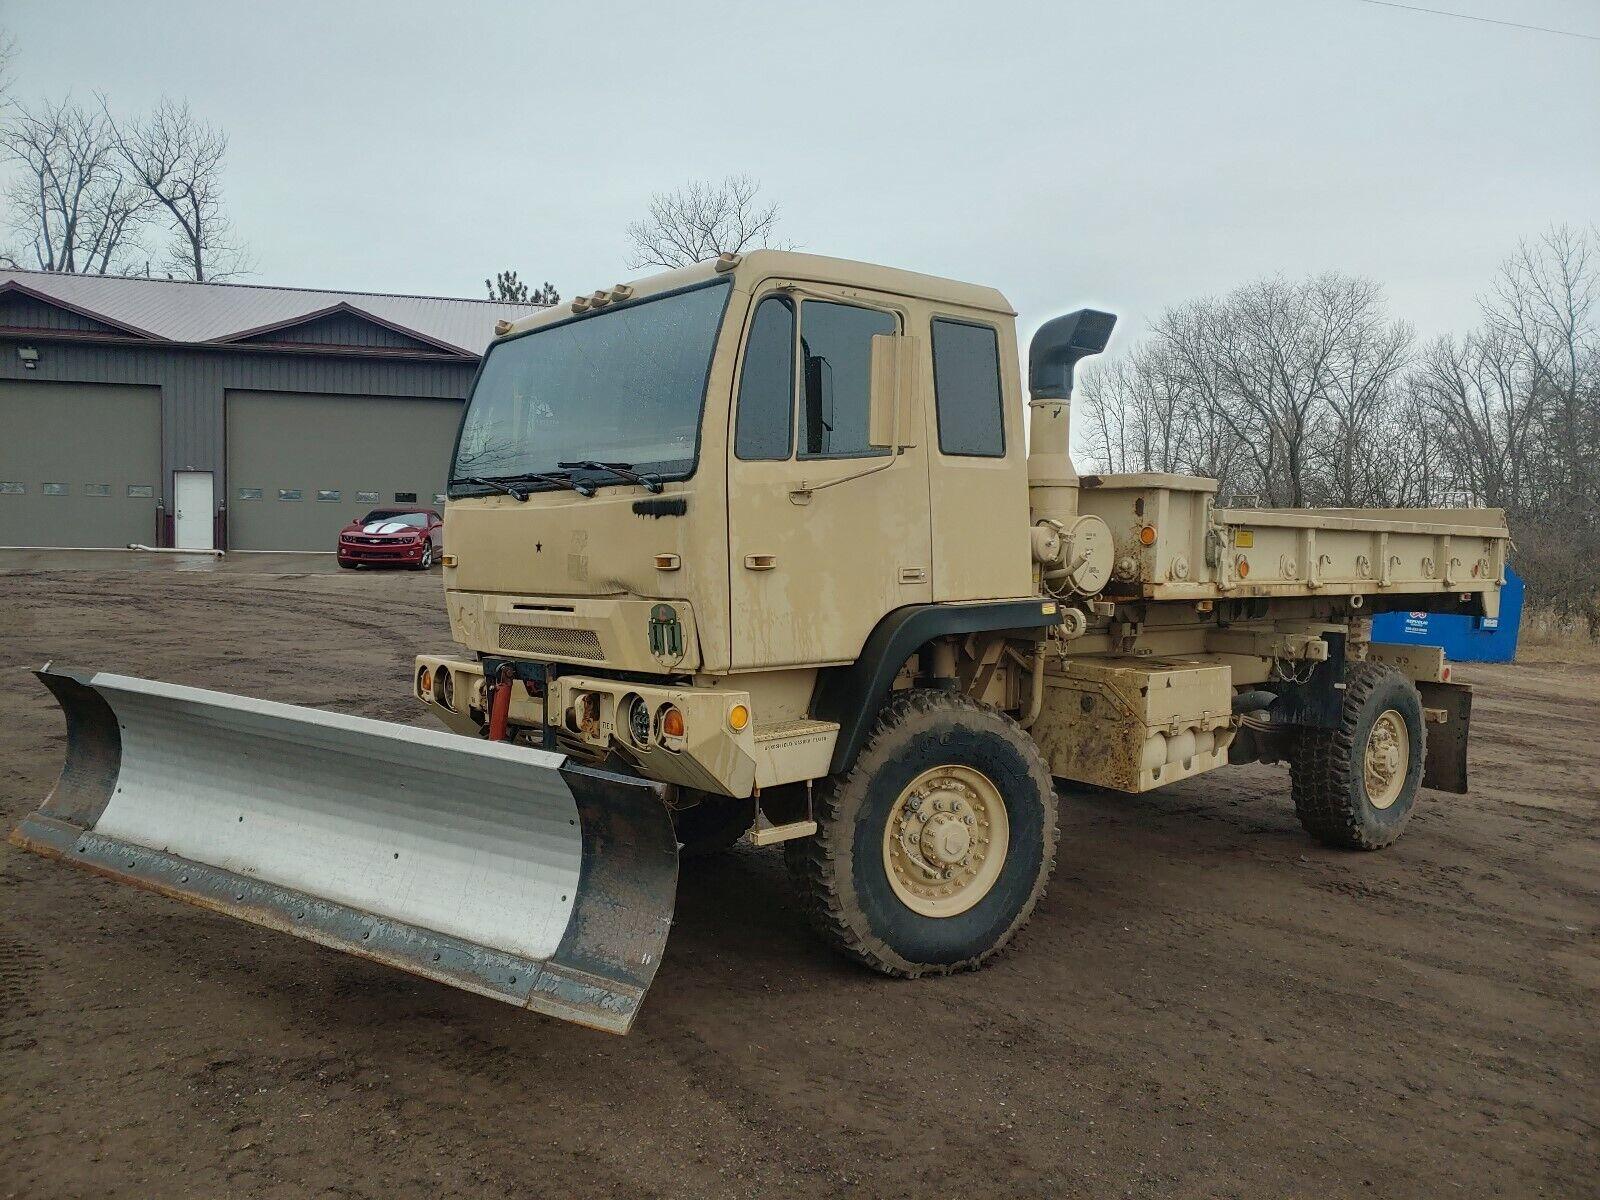 M1079 LMTV Cargo Truck Duece and a Half MTV Military 2.5 5 Ton HMMWV Hummer 6x6